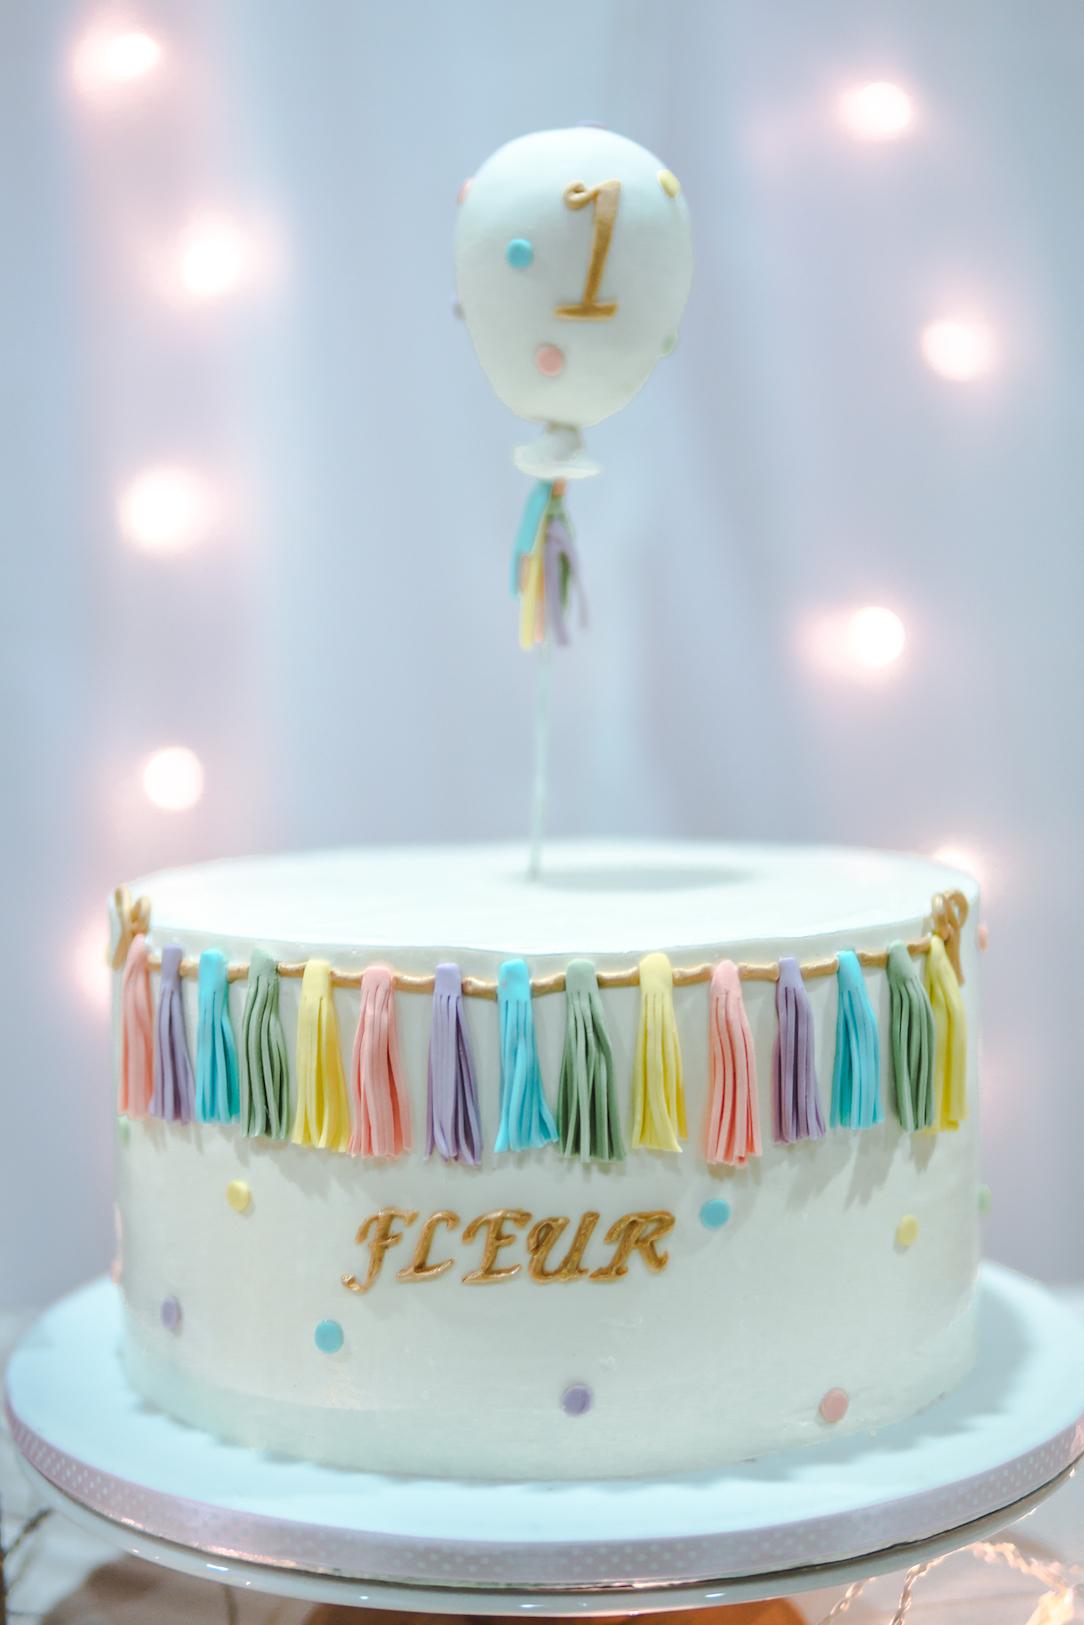 BIRTHDAY - Fleur's 1st